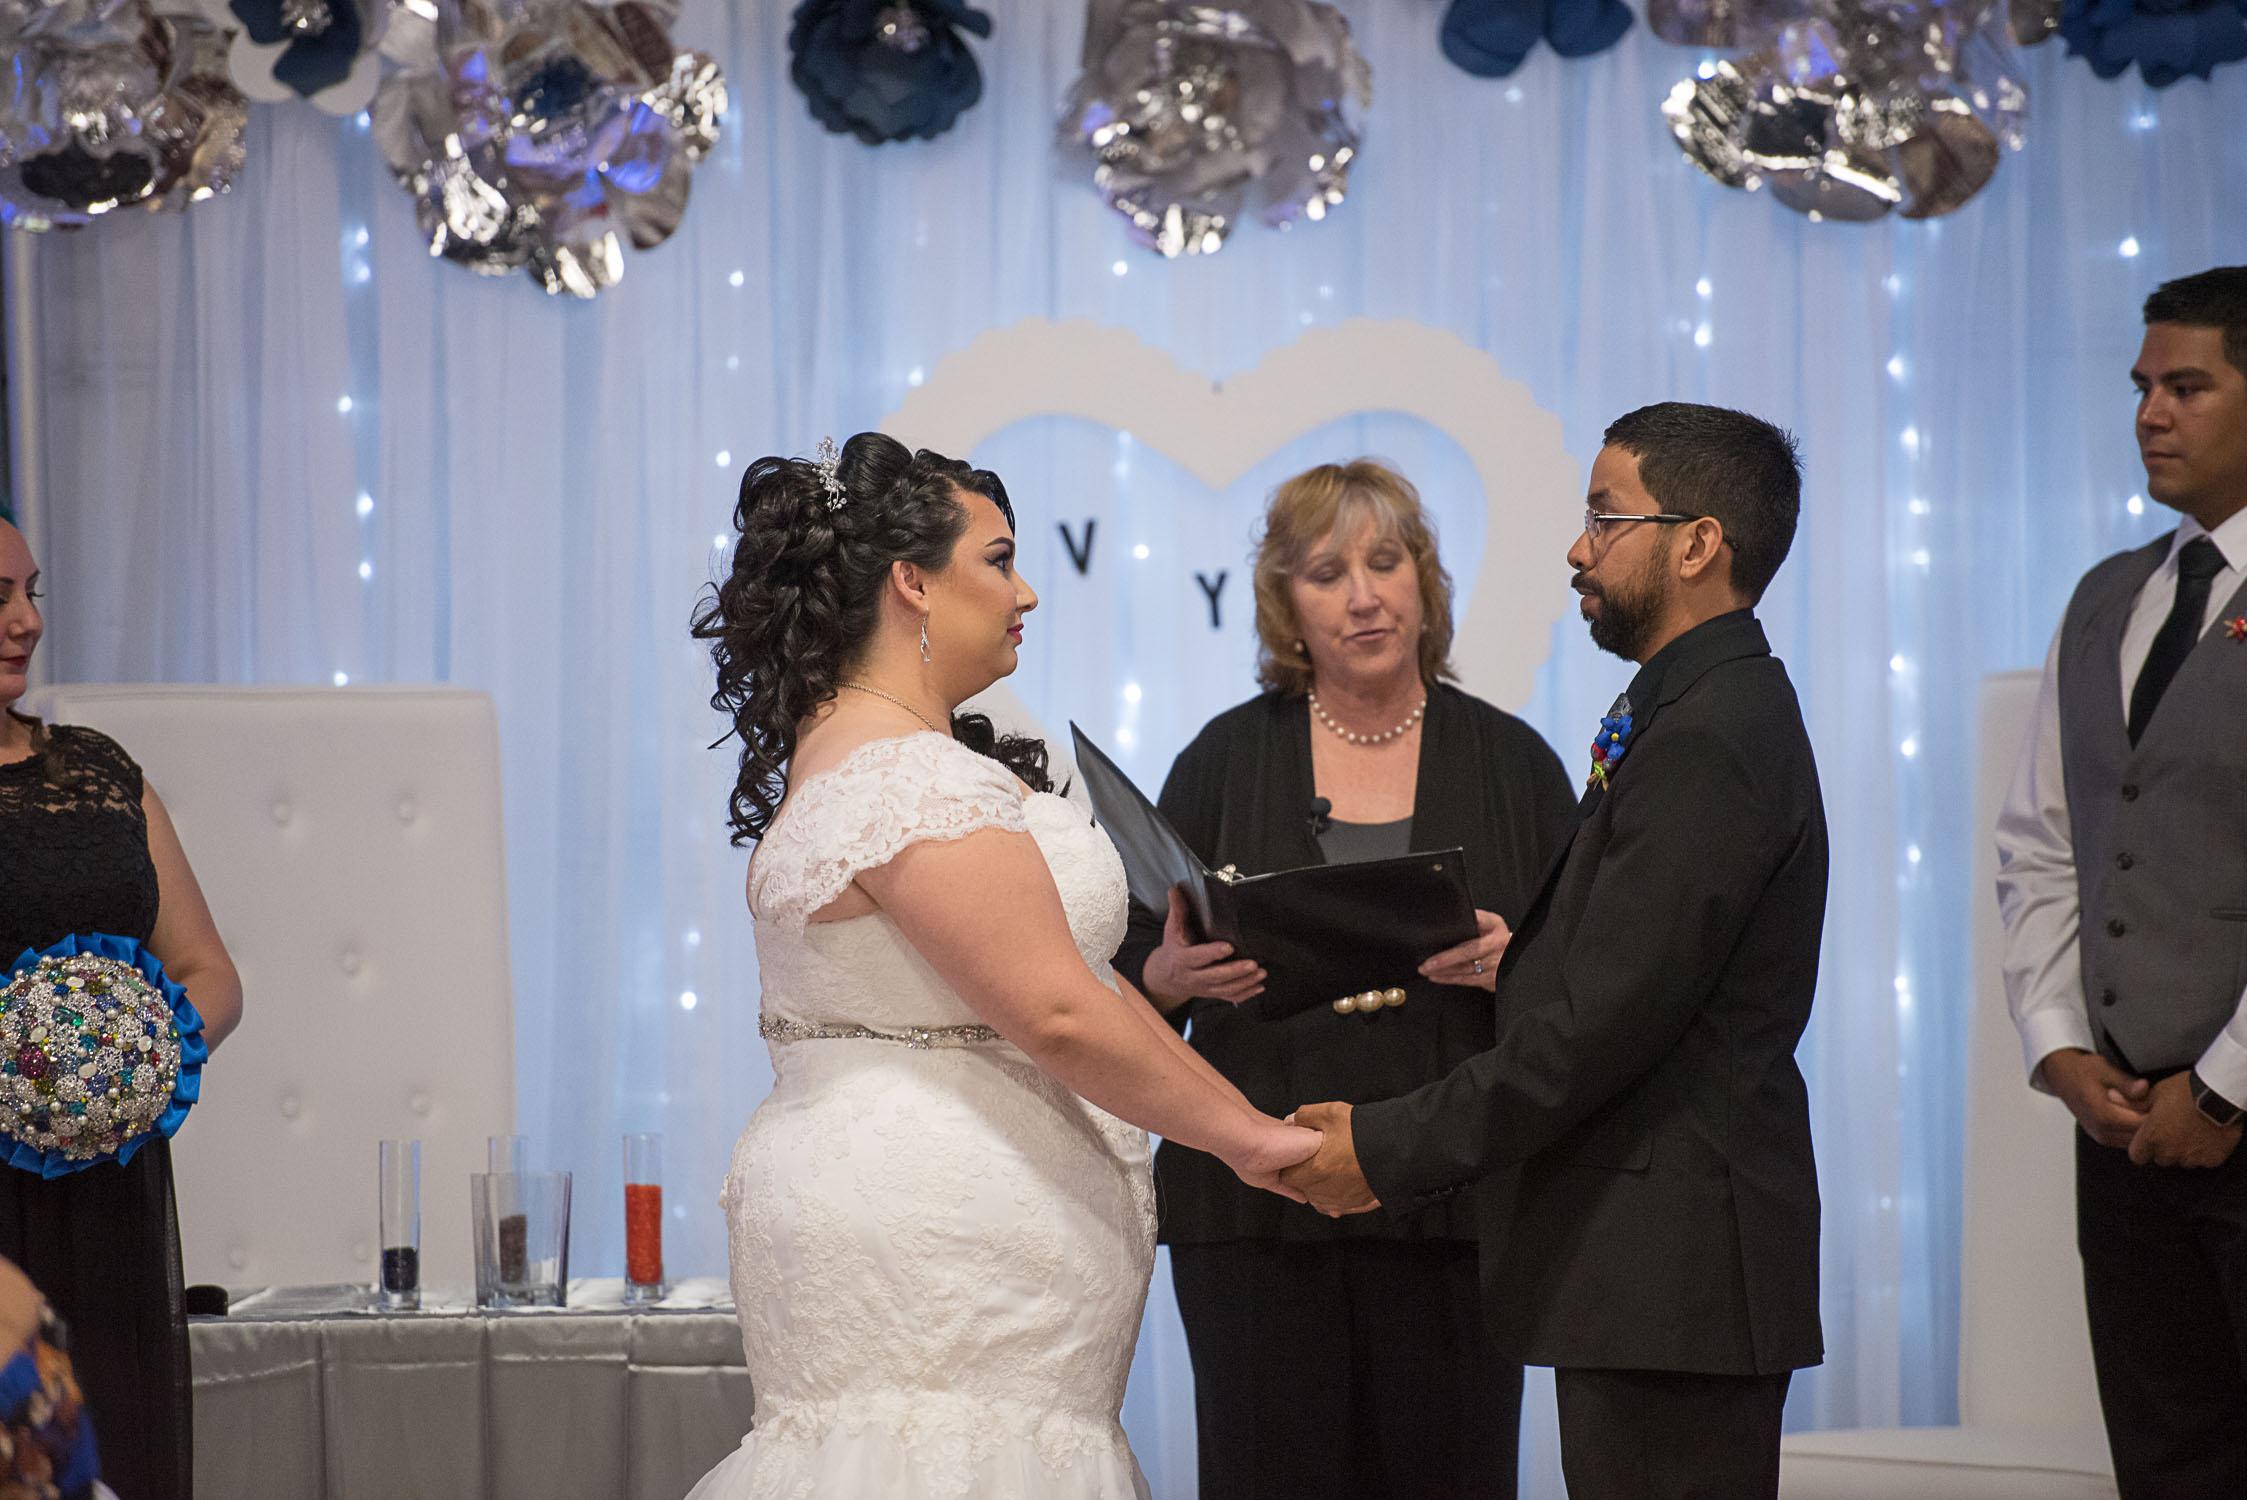 Leal Wedding Mira Visu Photography-112.jpg